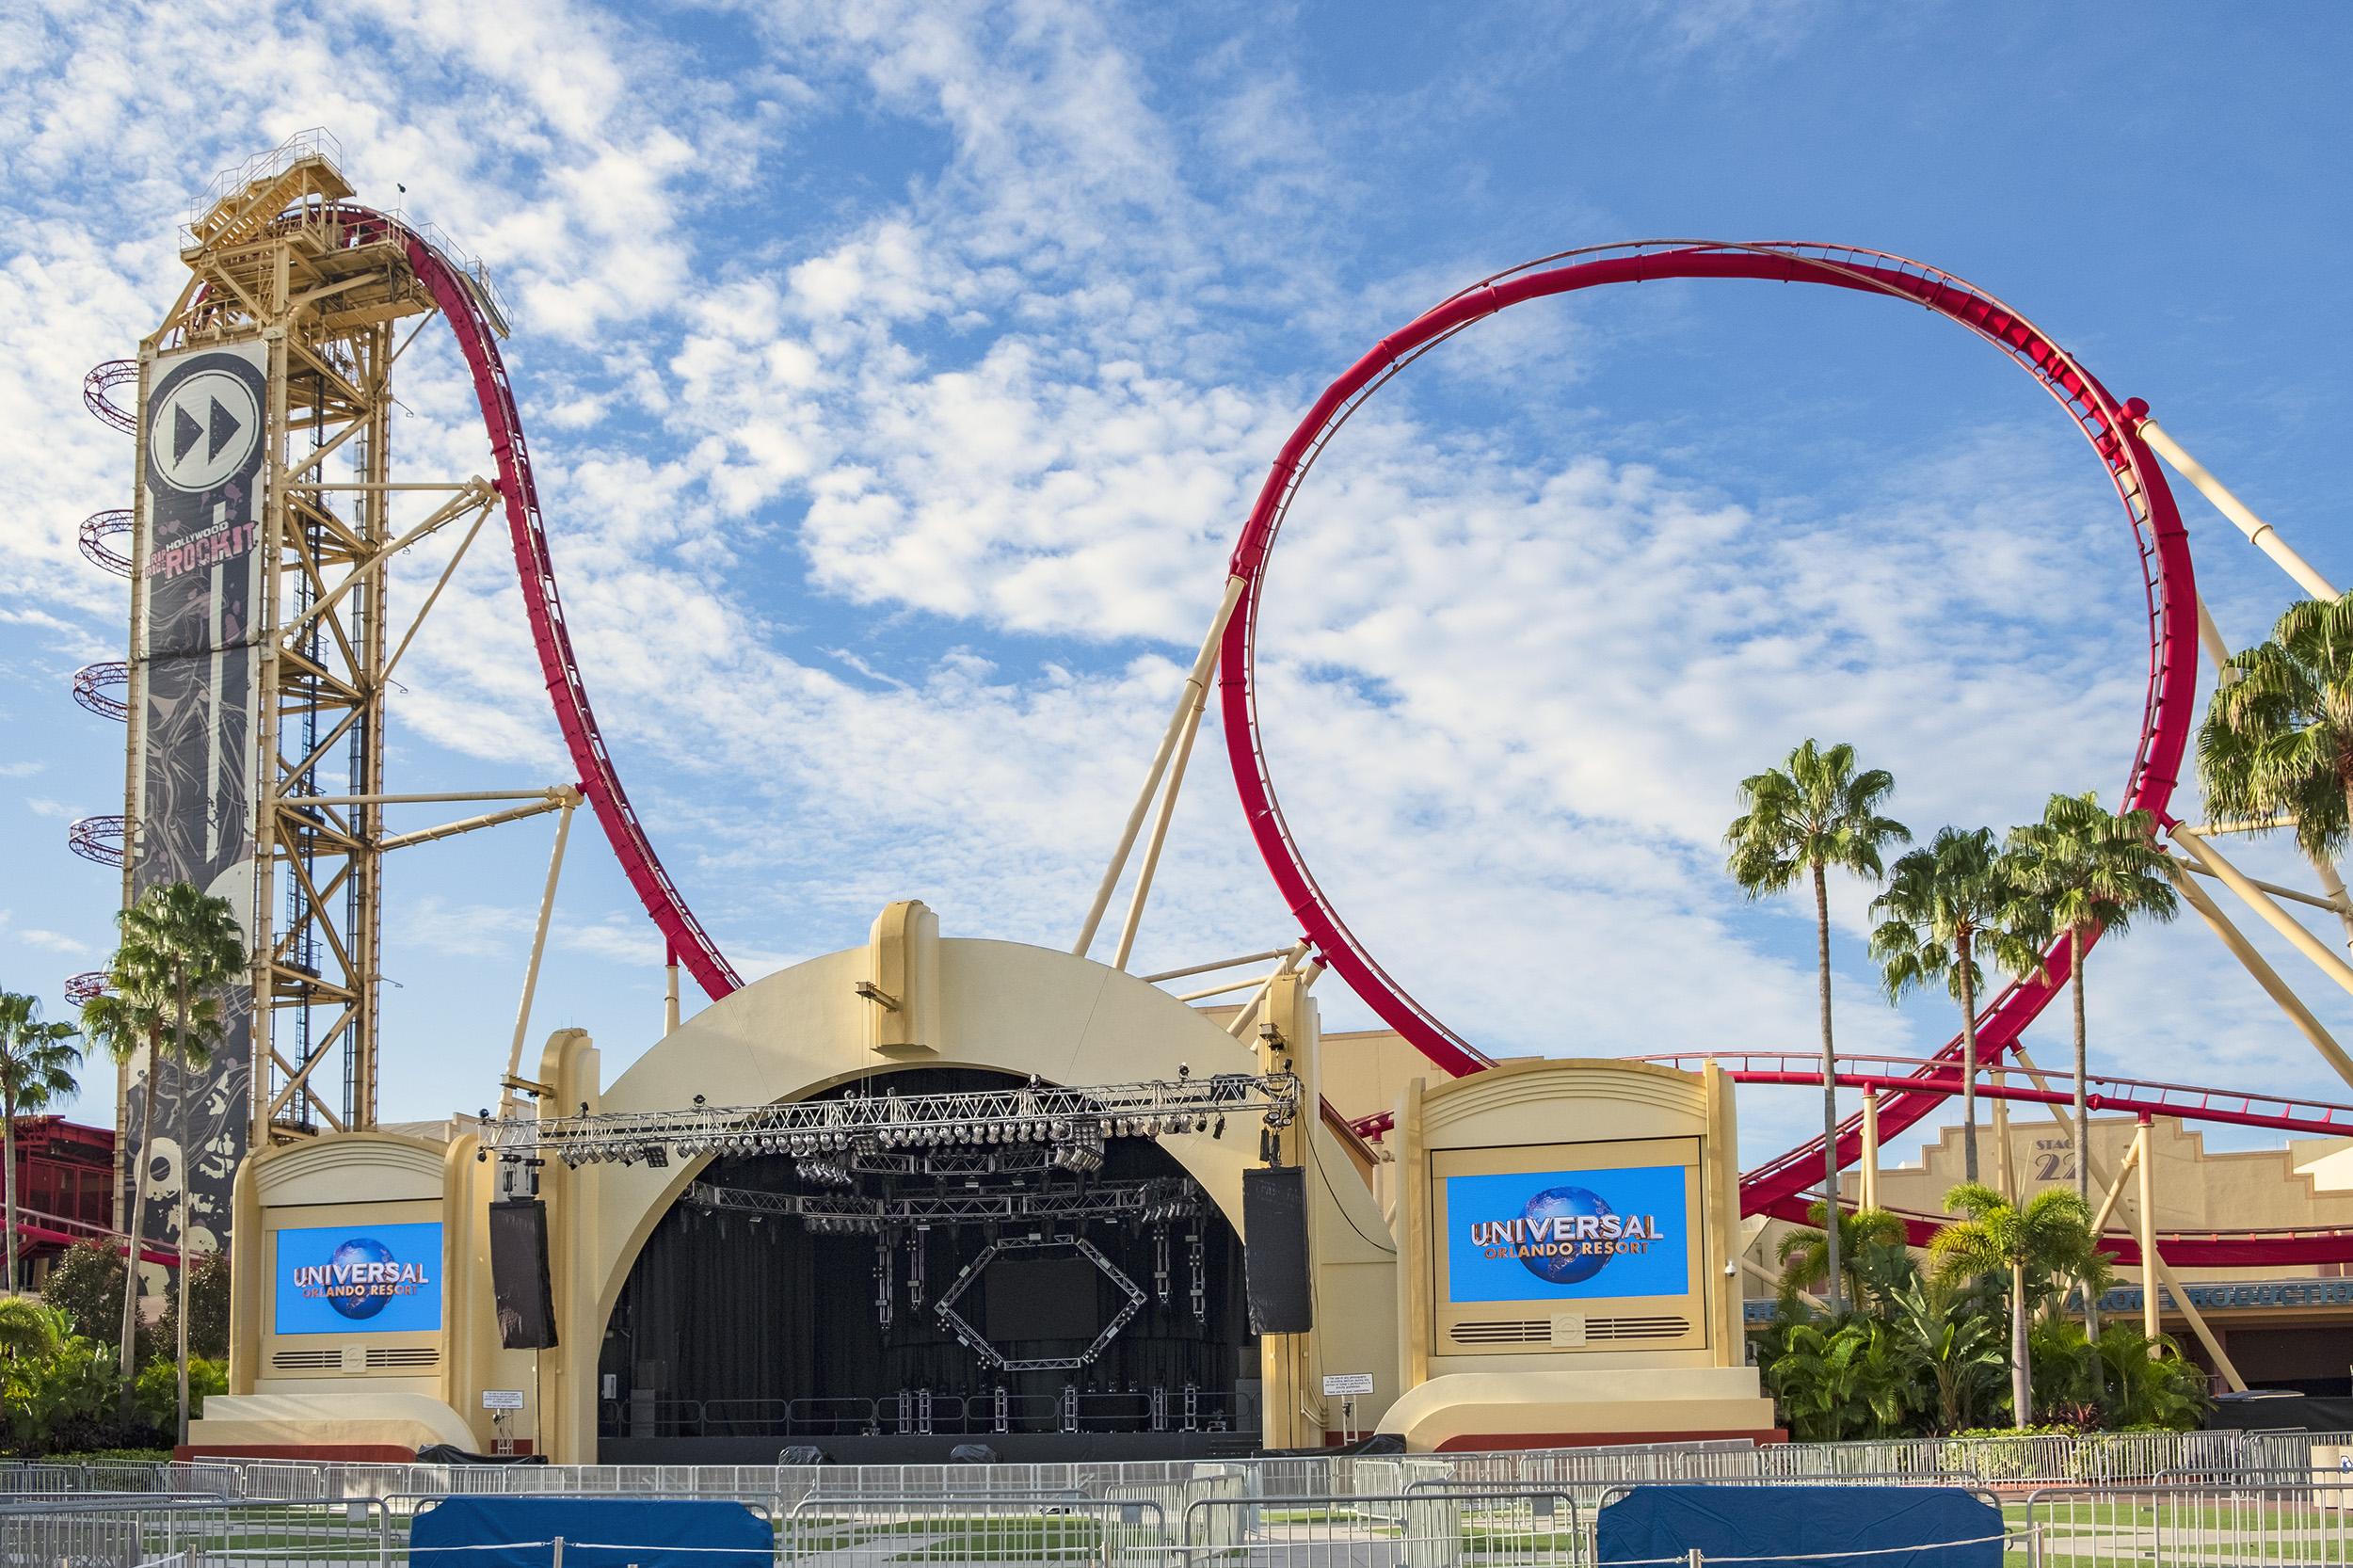 Hollywood Rip Ride Rockit Universal Studios Florida